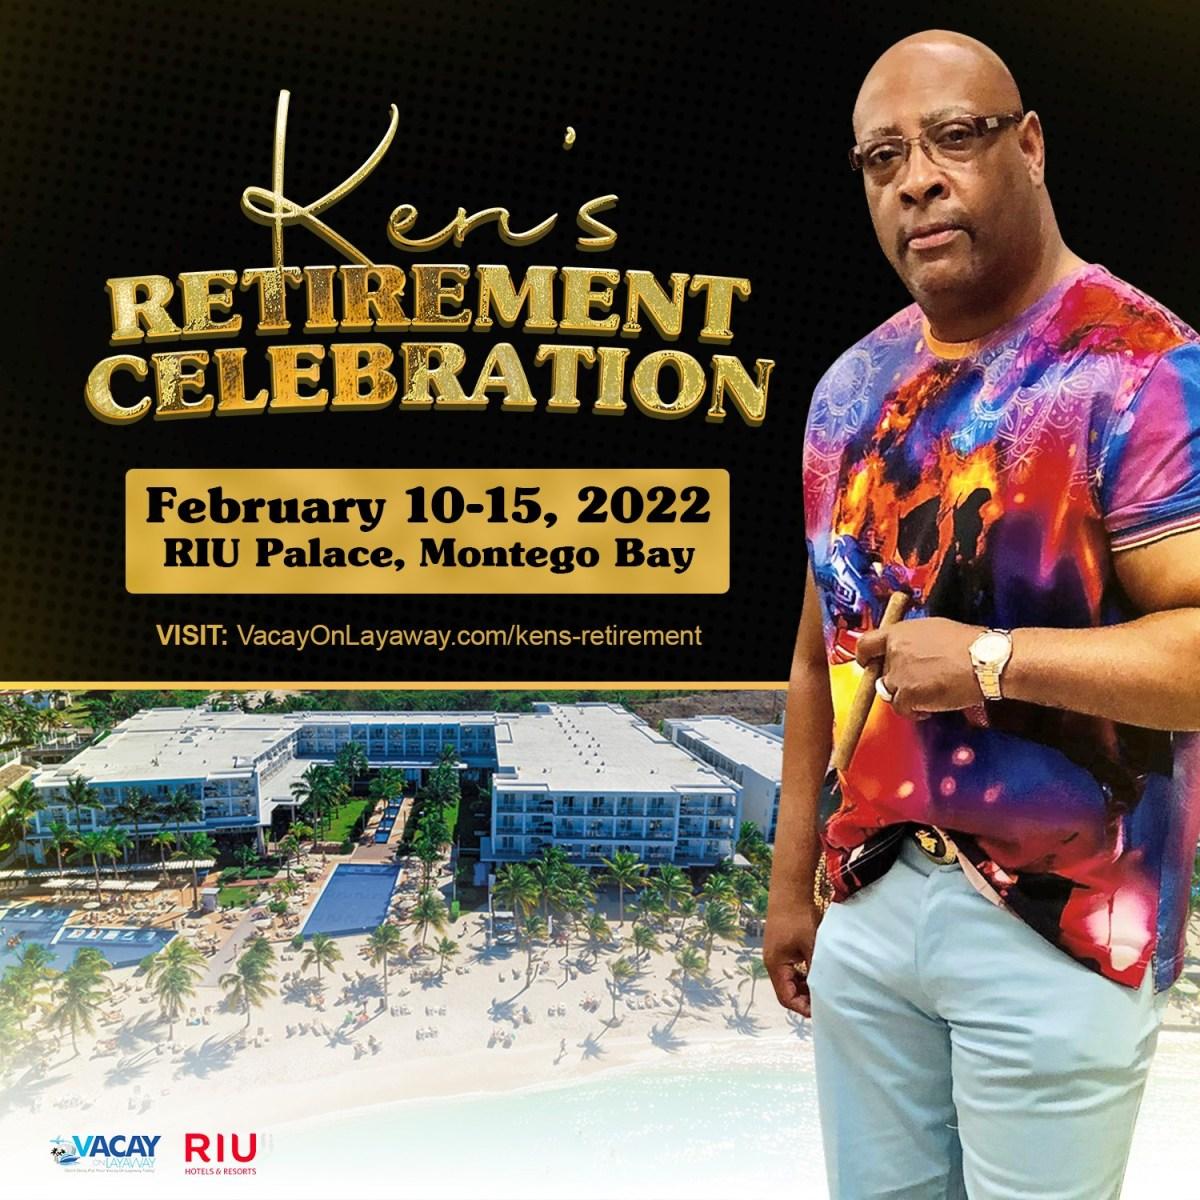 Kens Retirement